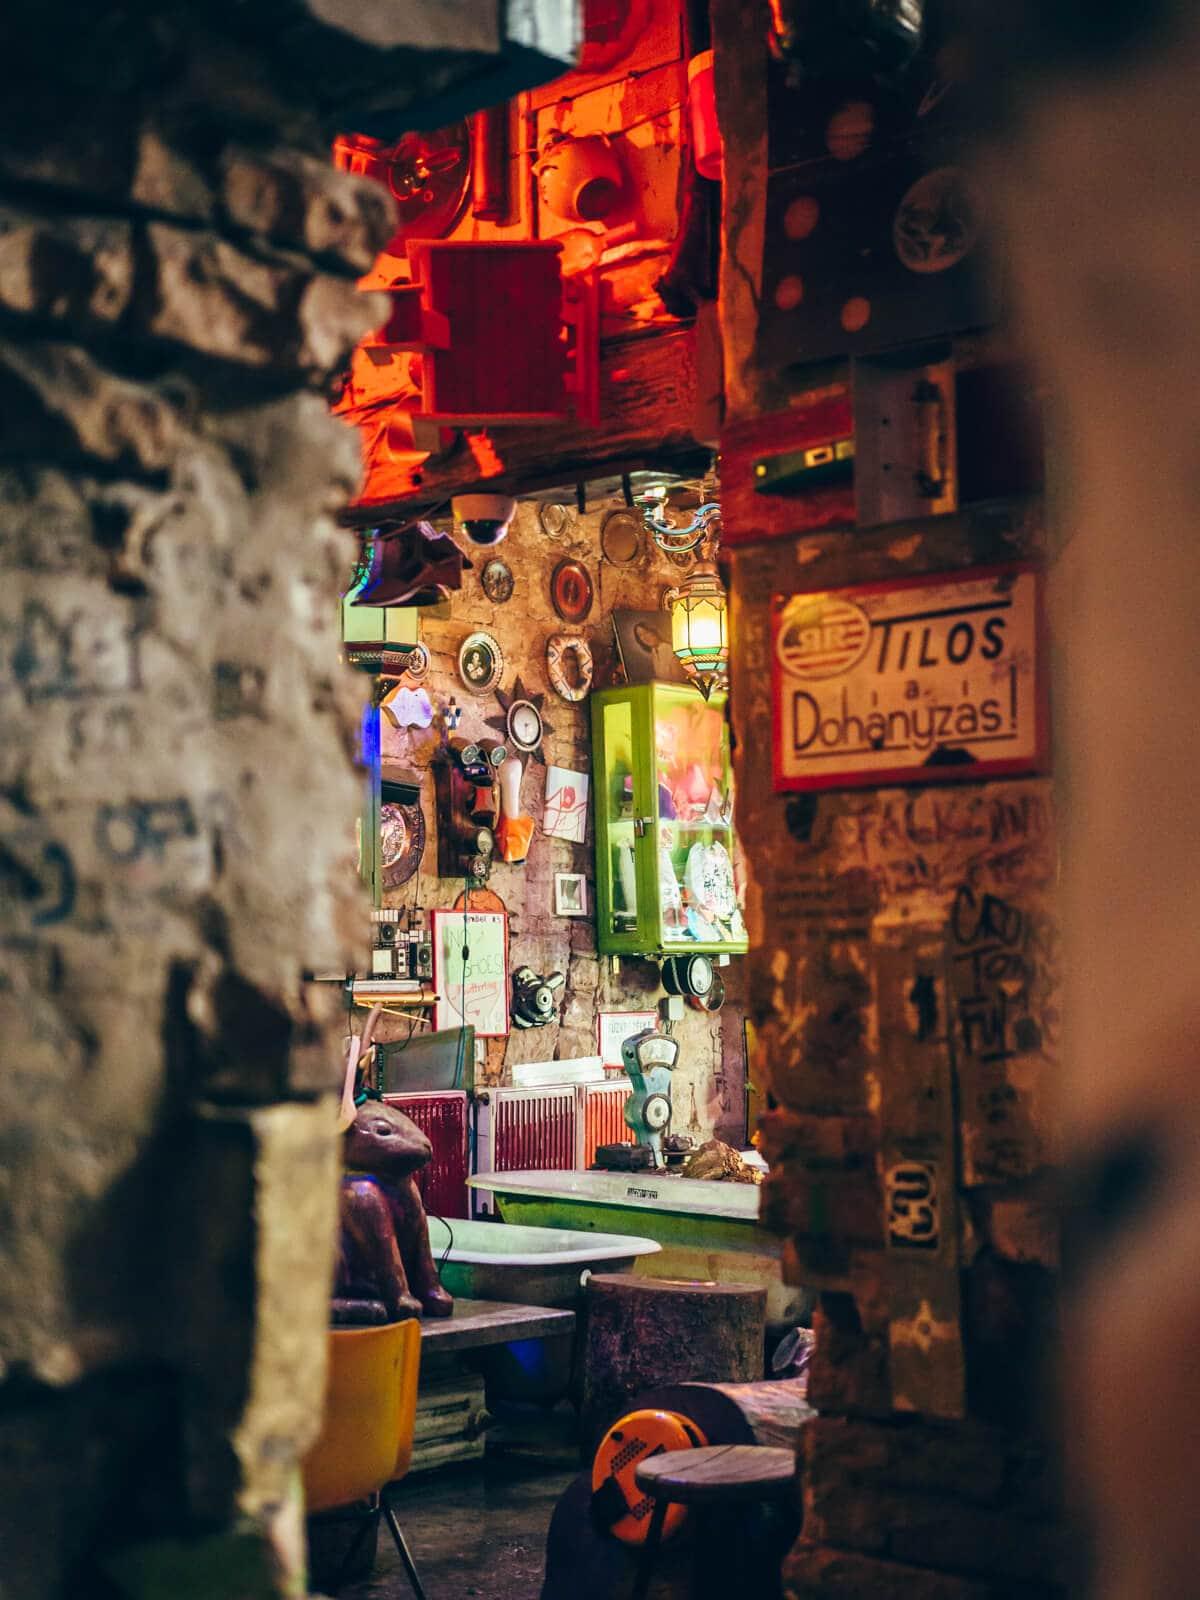 Budapest Instagram photo guide - Szimpla Kert the famous ruin bar